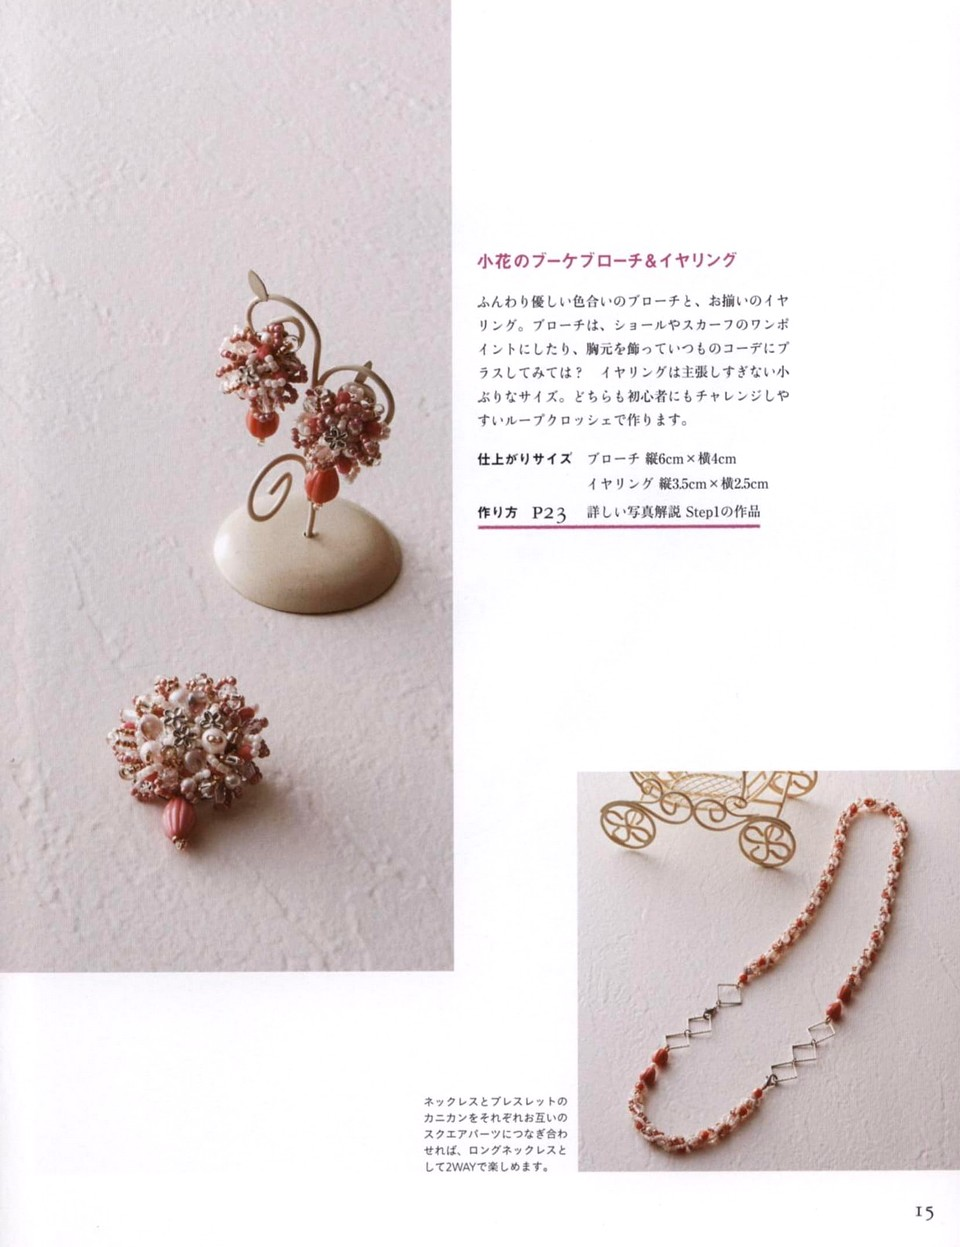 717 Beads Crochet 17-16